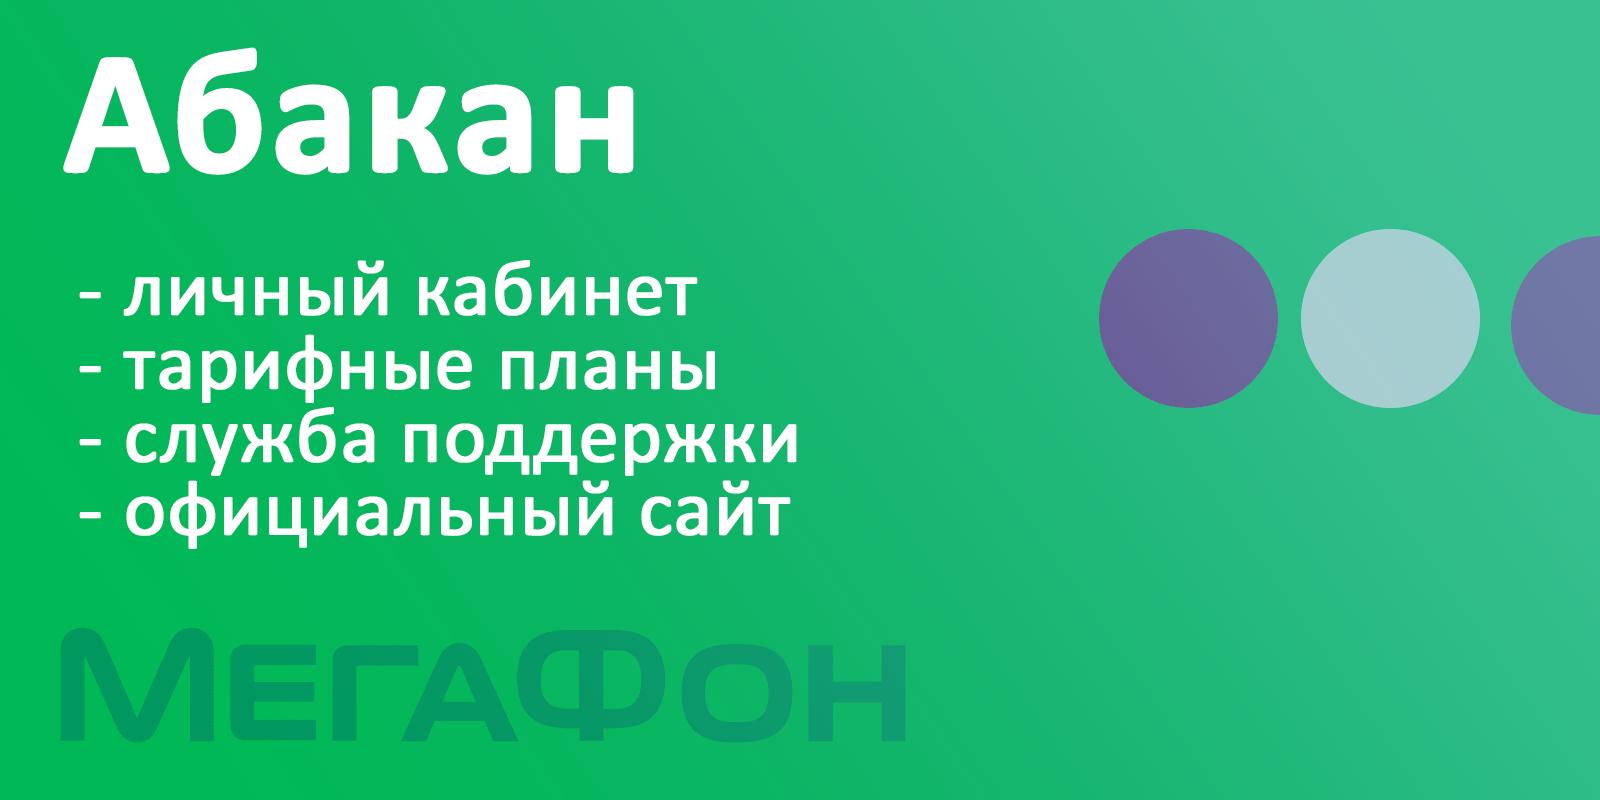 Мегафон Абакан - тарифы, интернет-магазин, официальный сайт